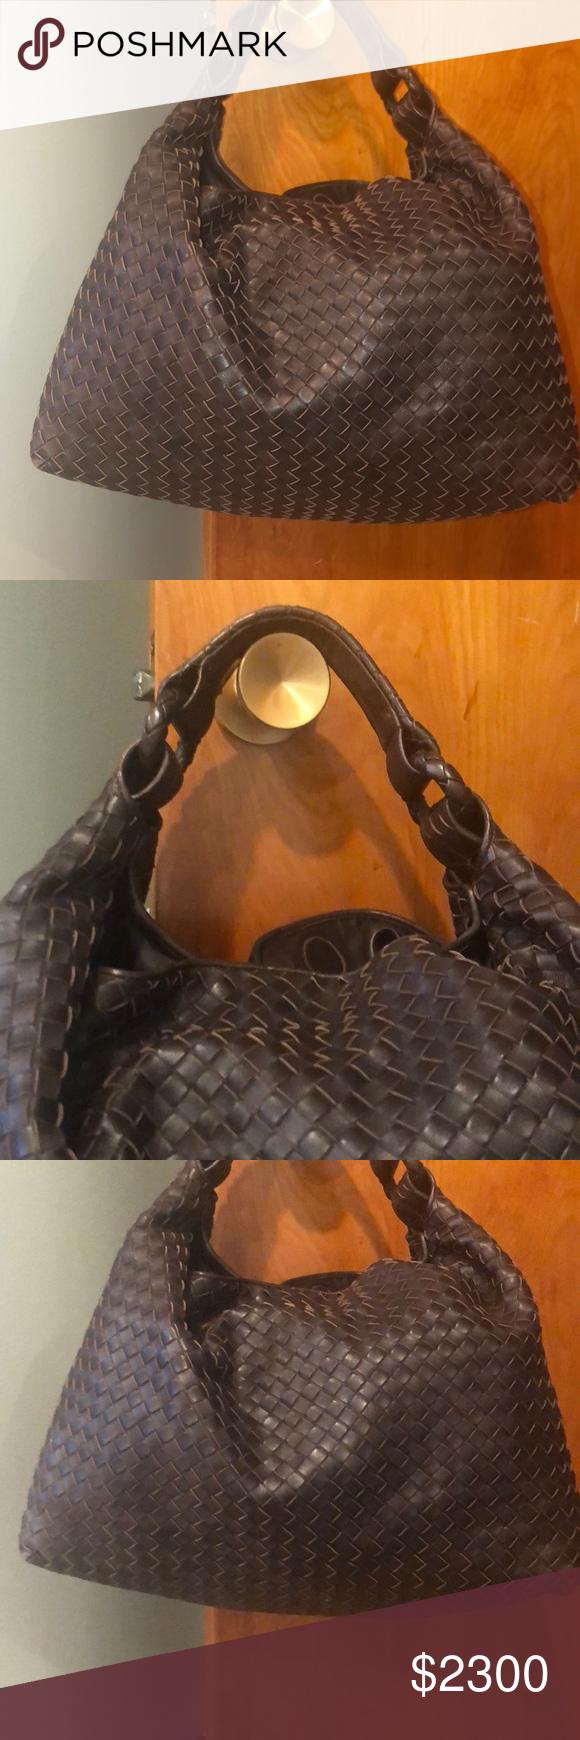 100percent Authentic Bottega Veneta Bag Never Used Bottega Veneta Bag Bags Bottega Veneta Bags